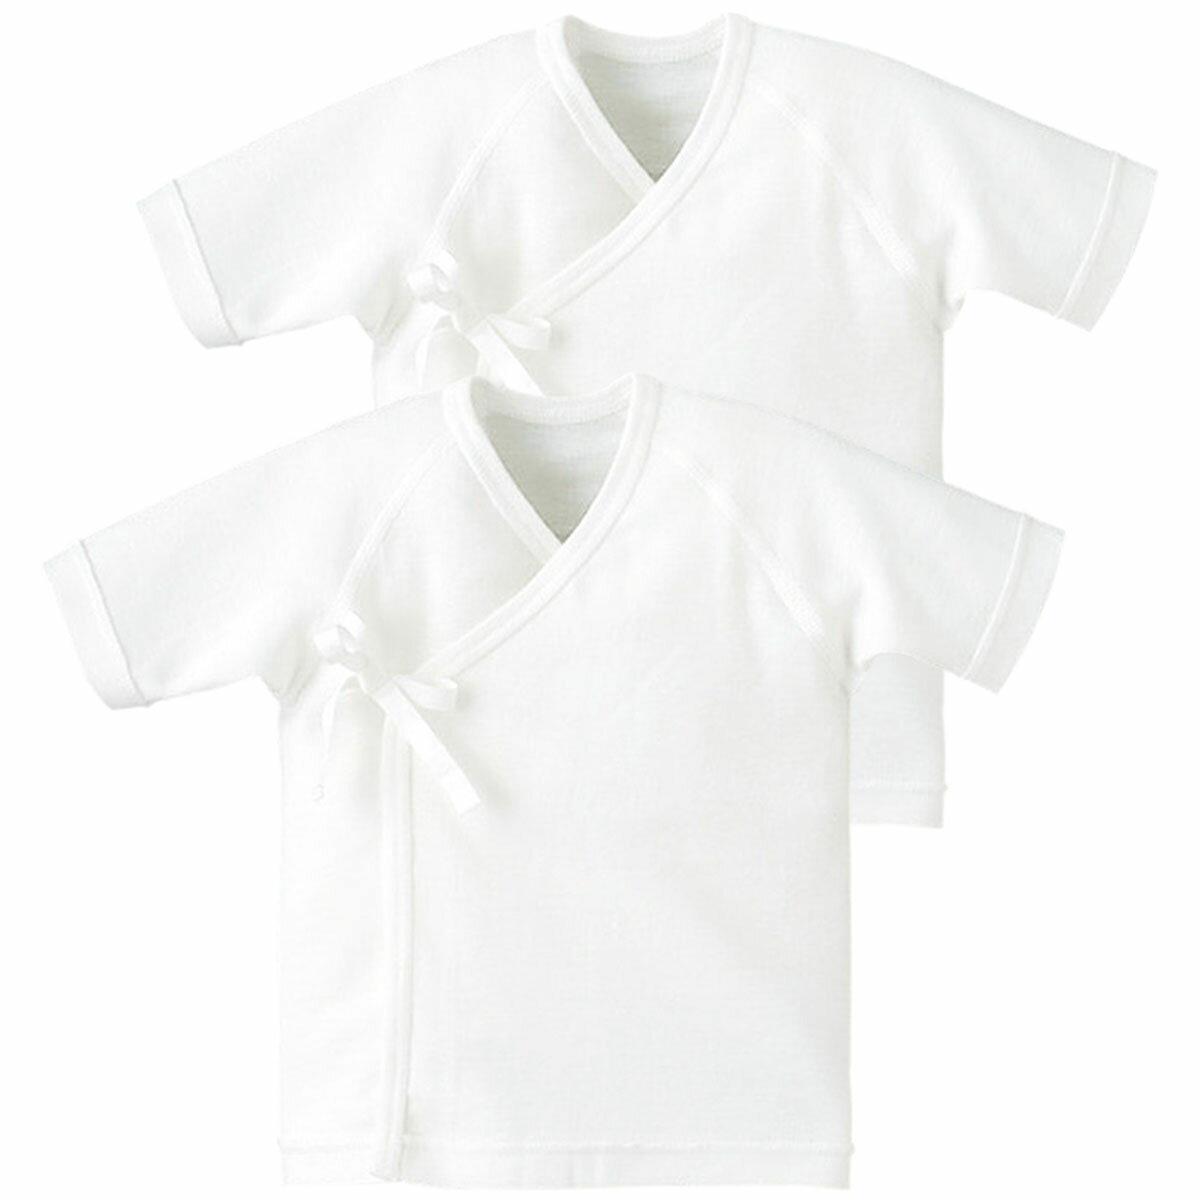 【20%OFF】短肌着2枚組 《コンビミニ》 ベビー 子供 Combi mini 新生児服 肌着 秋冬 肌着セット 男の子 女の子 7分袖